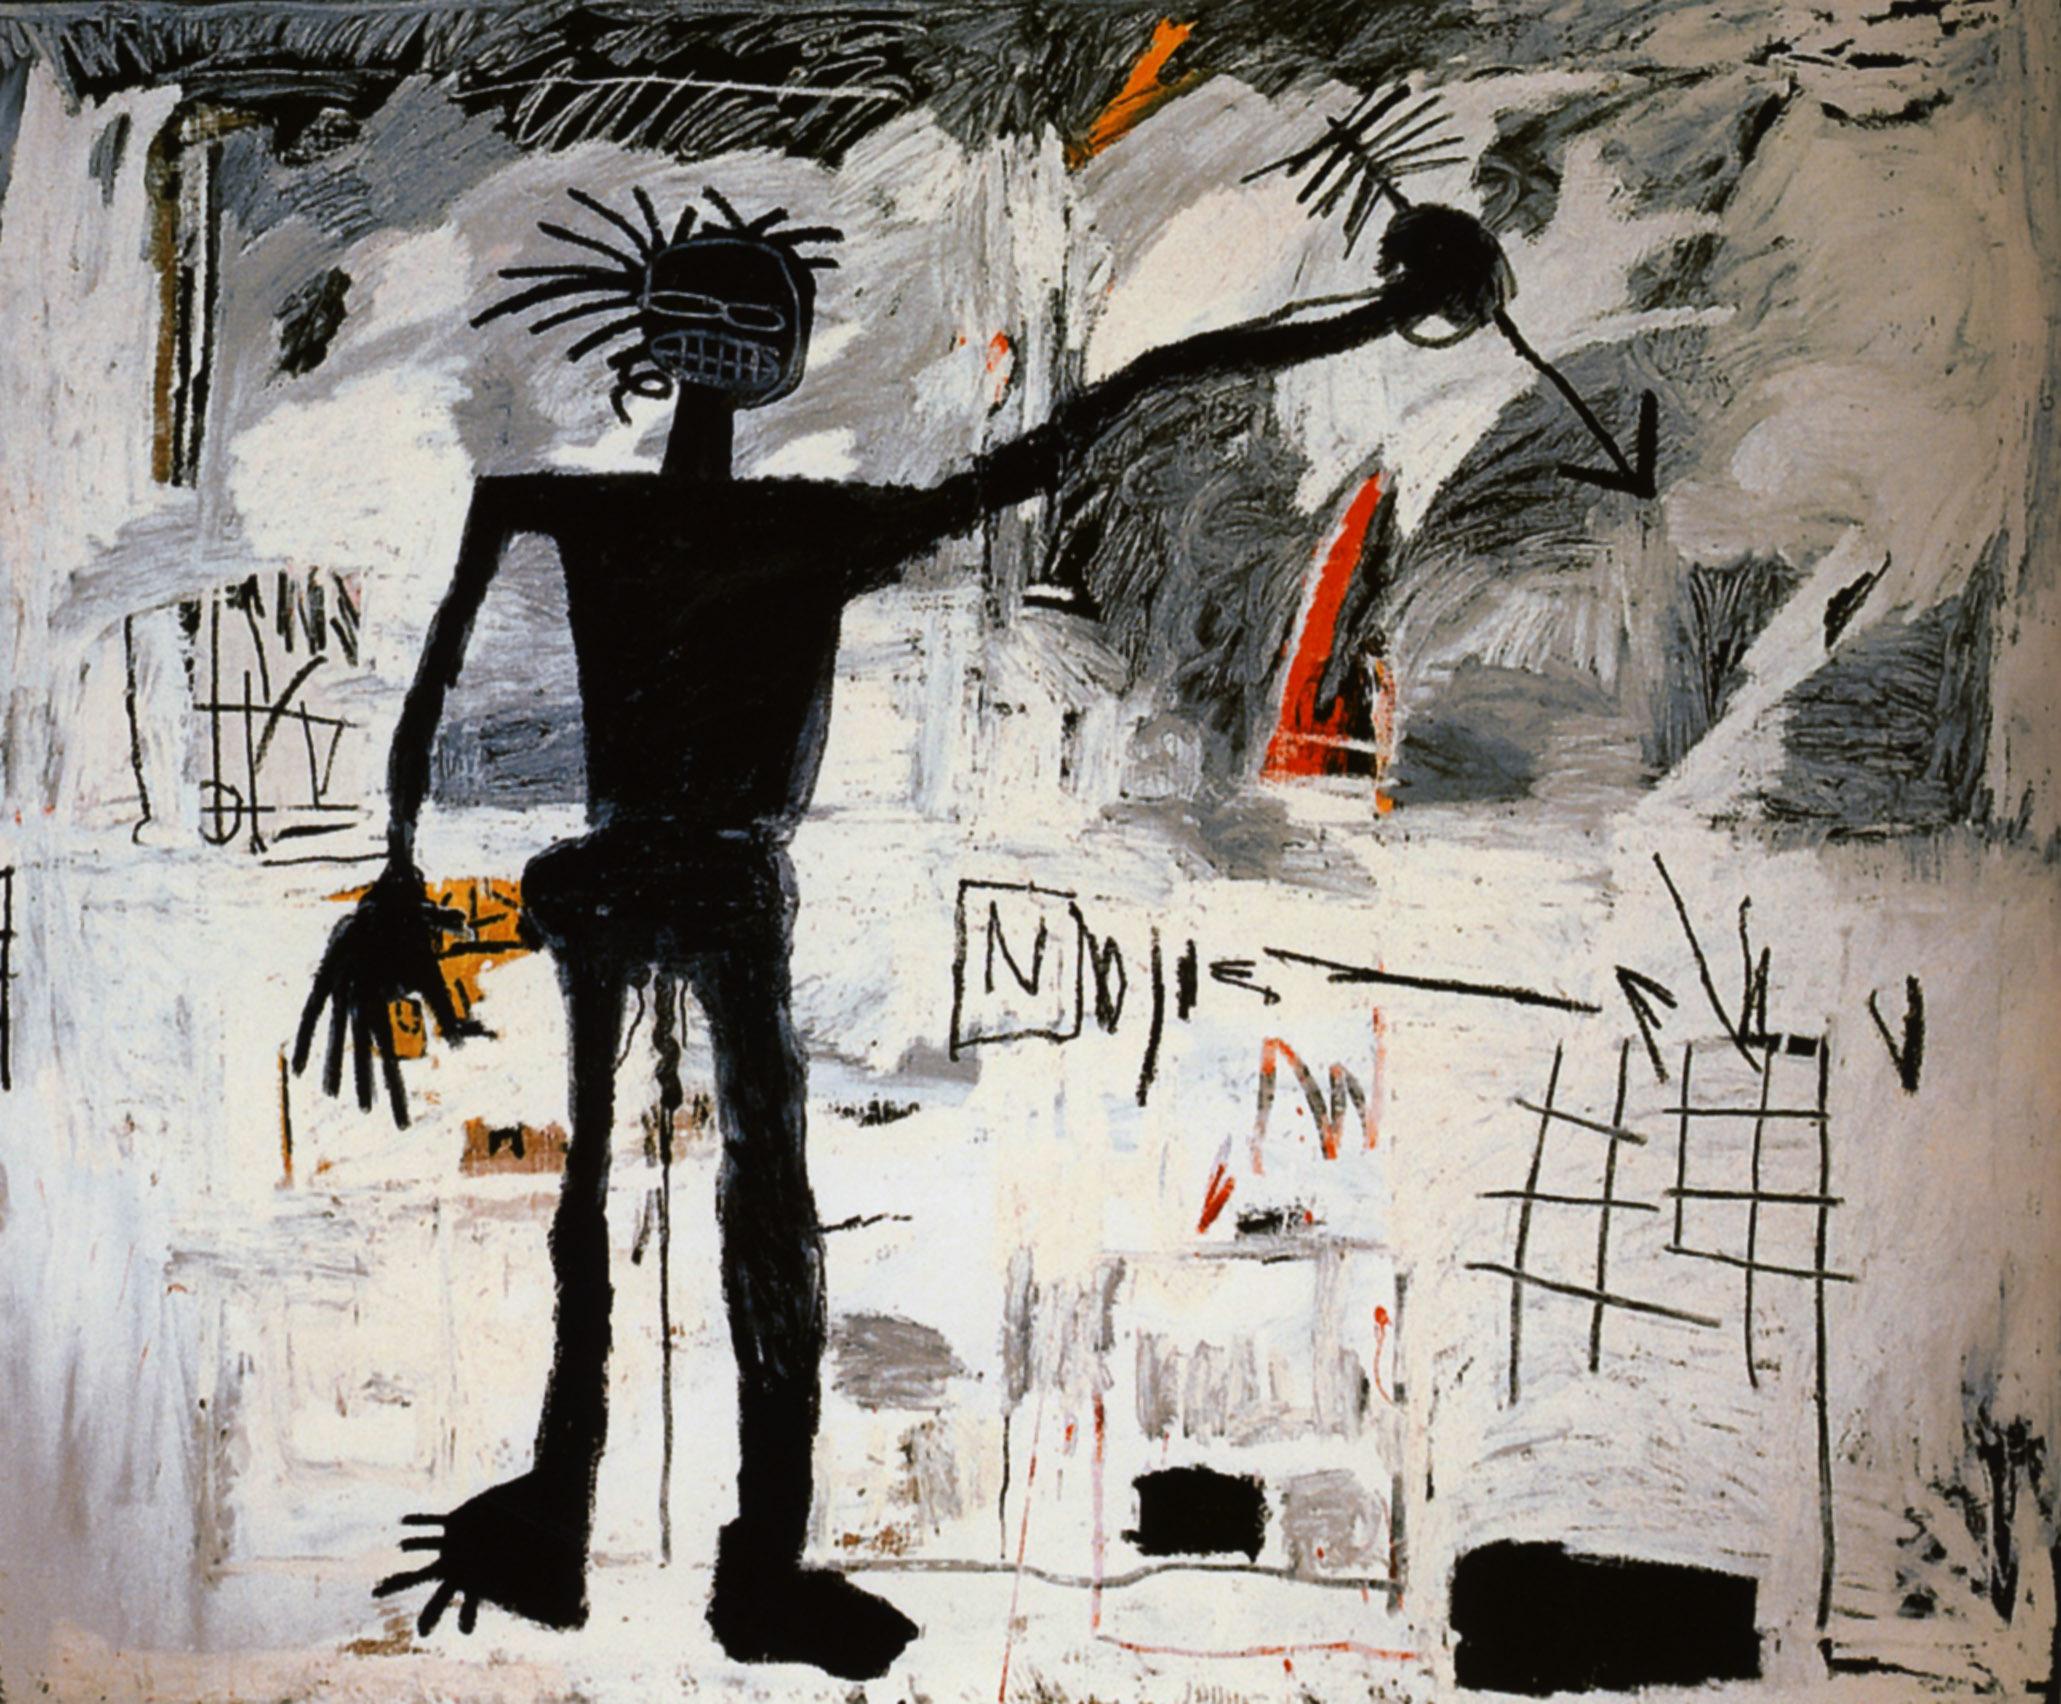 Jean Michel Basquiat – Self portrait, 1982